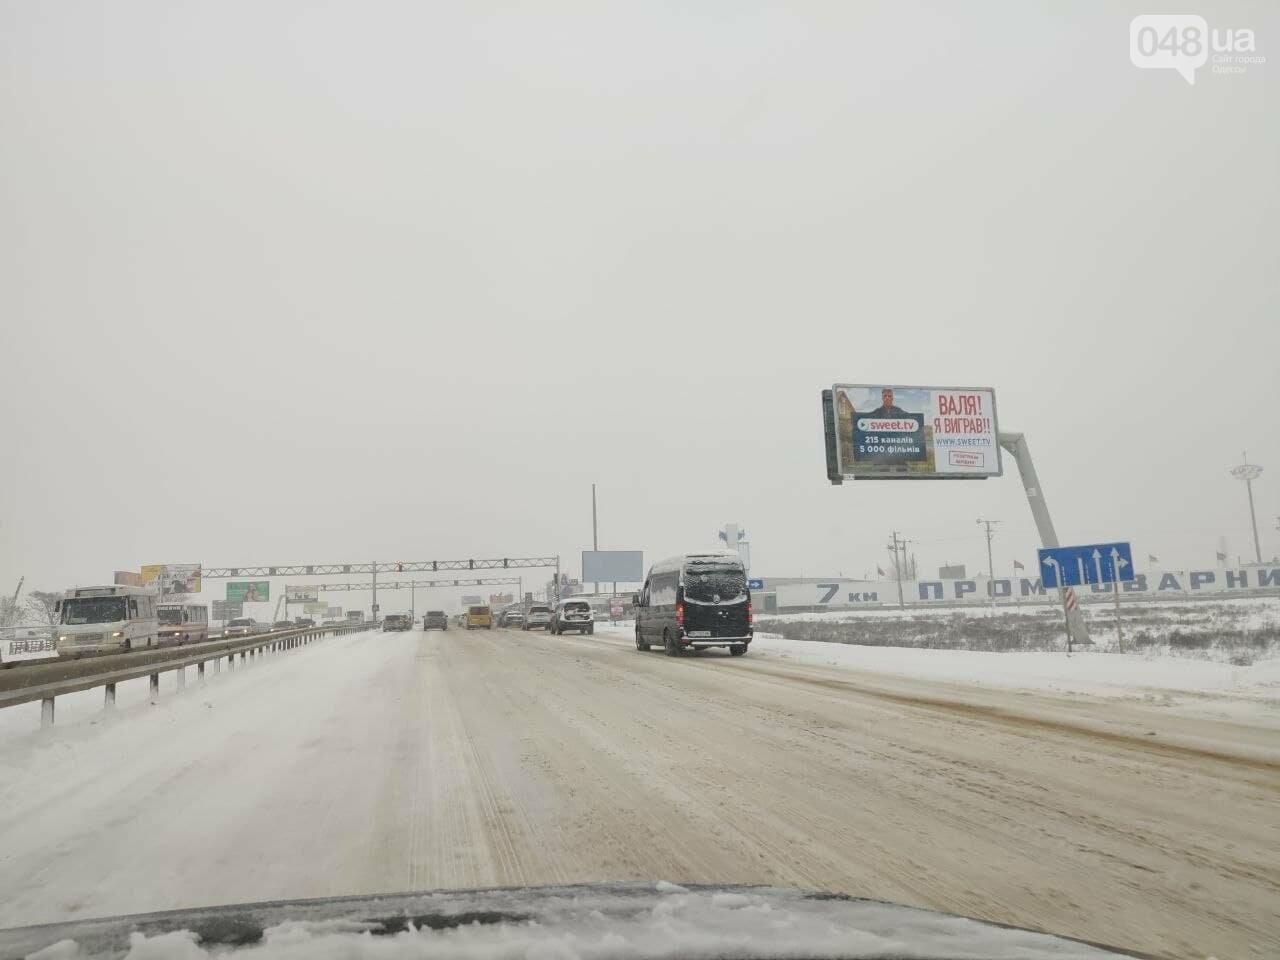 Одессу замело: ситуация на дорогах и тротуарах в городе, - ФОТО, фото-3